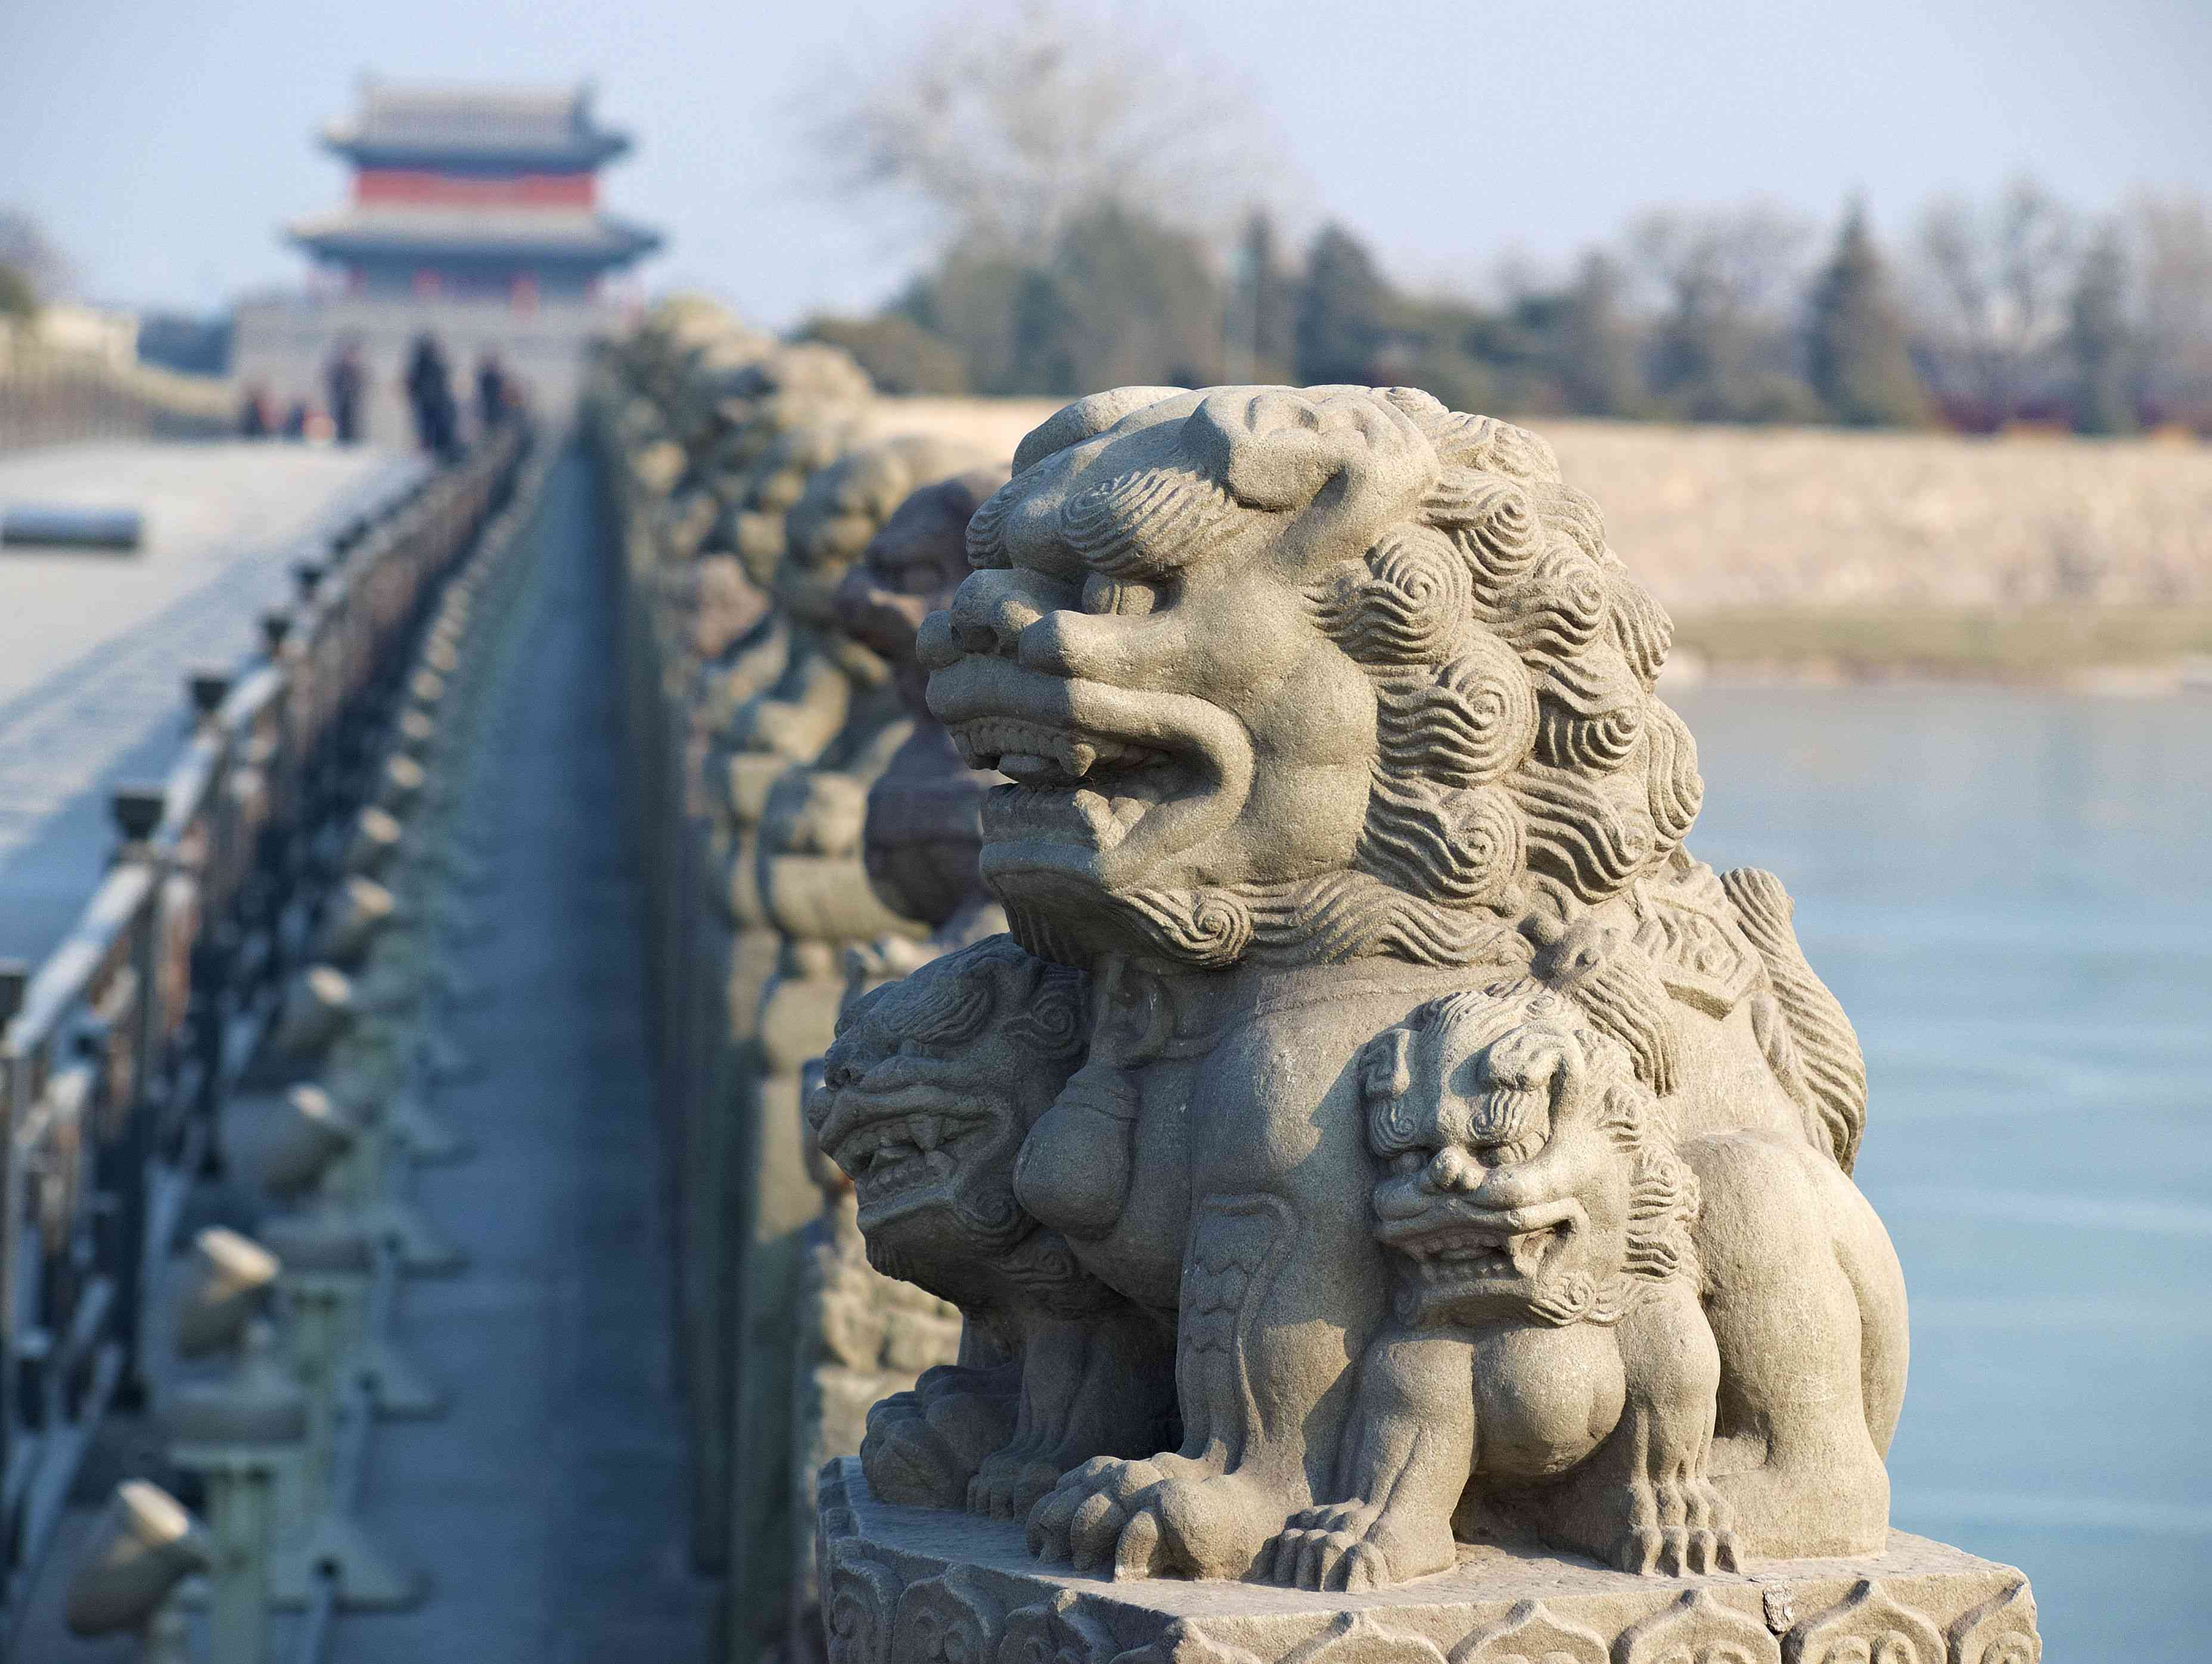 Lions at Marco Polo Bridge